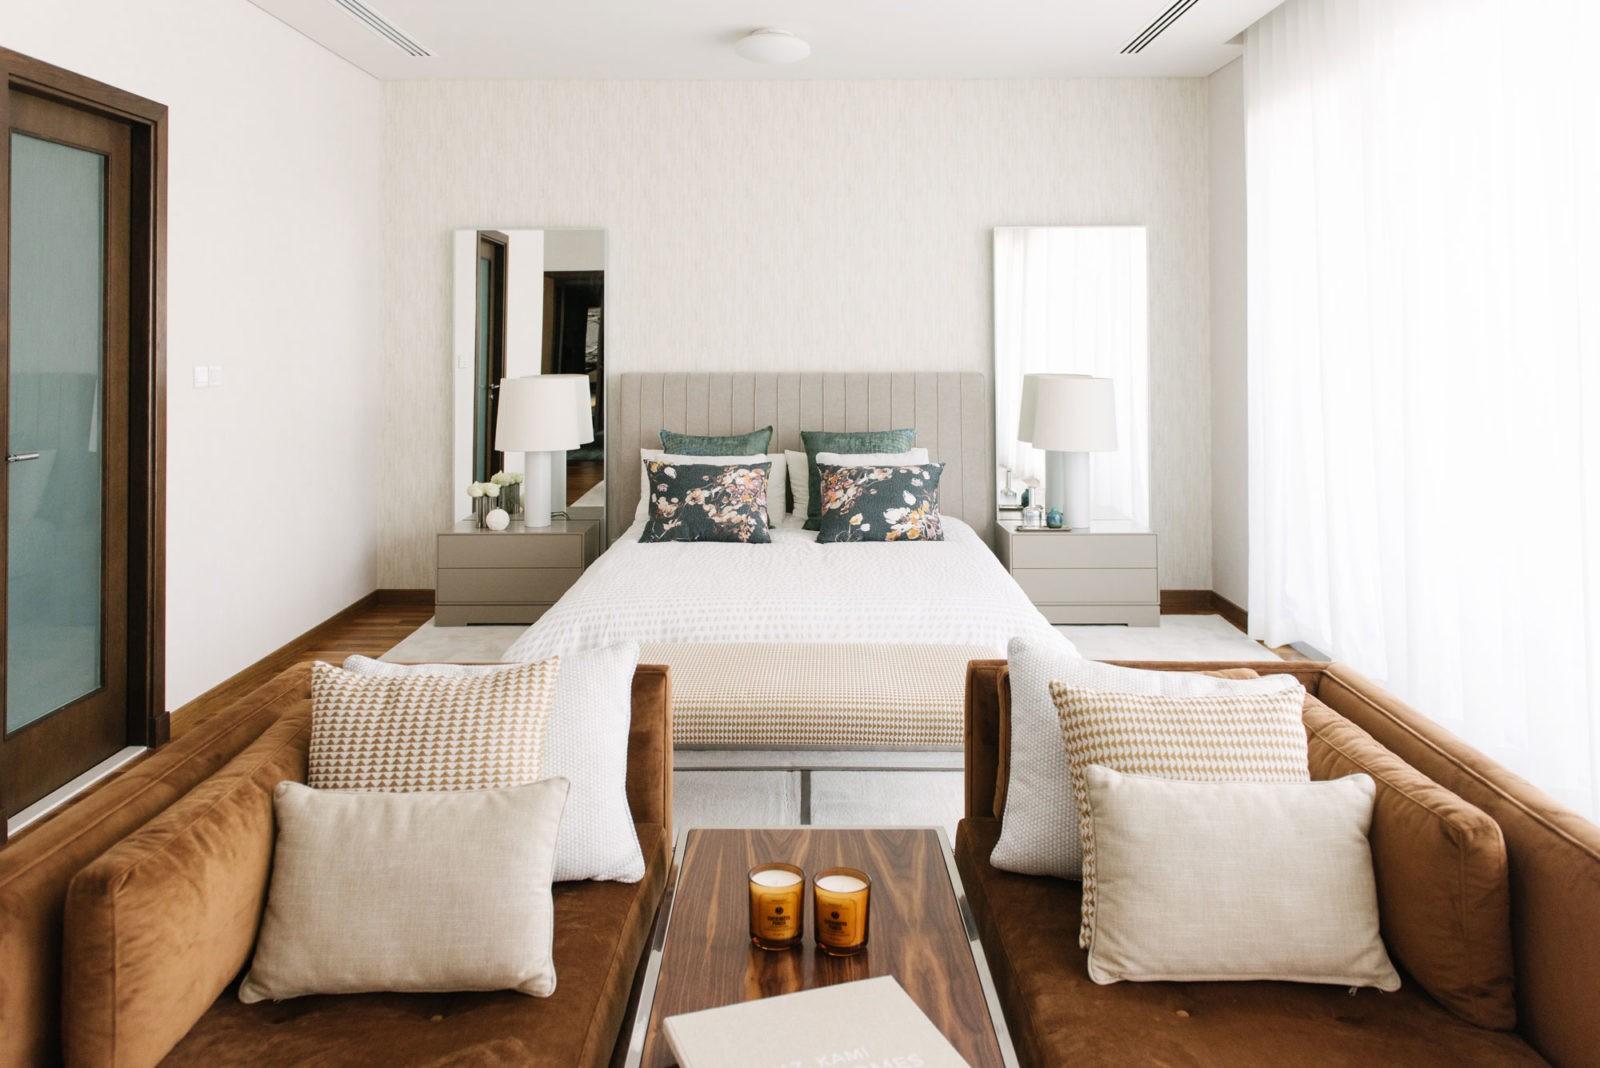 Burj Daman Apartment - Sneha Divias Atelier